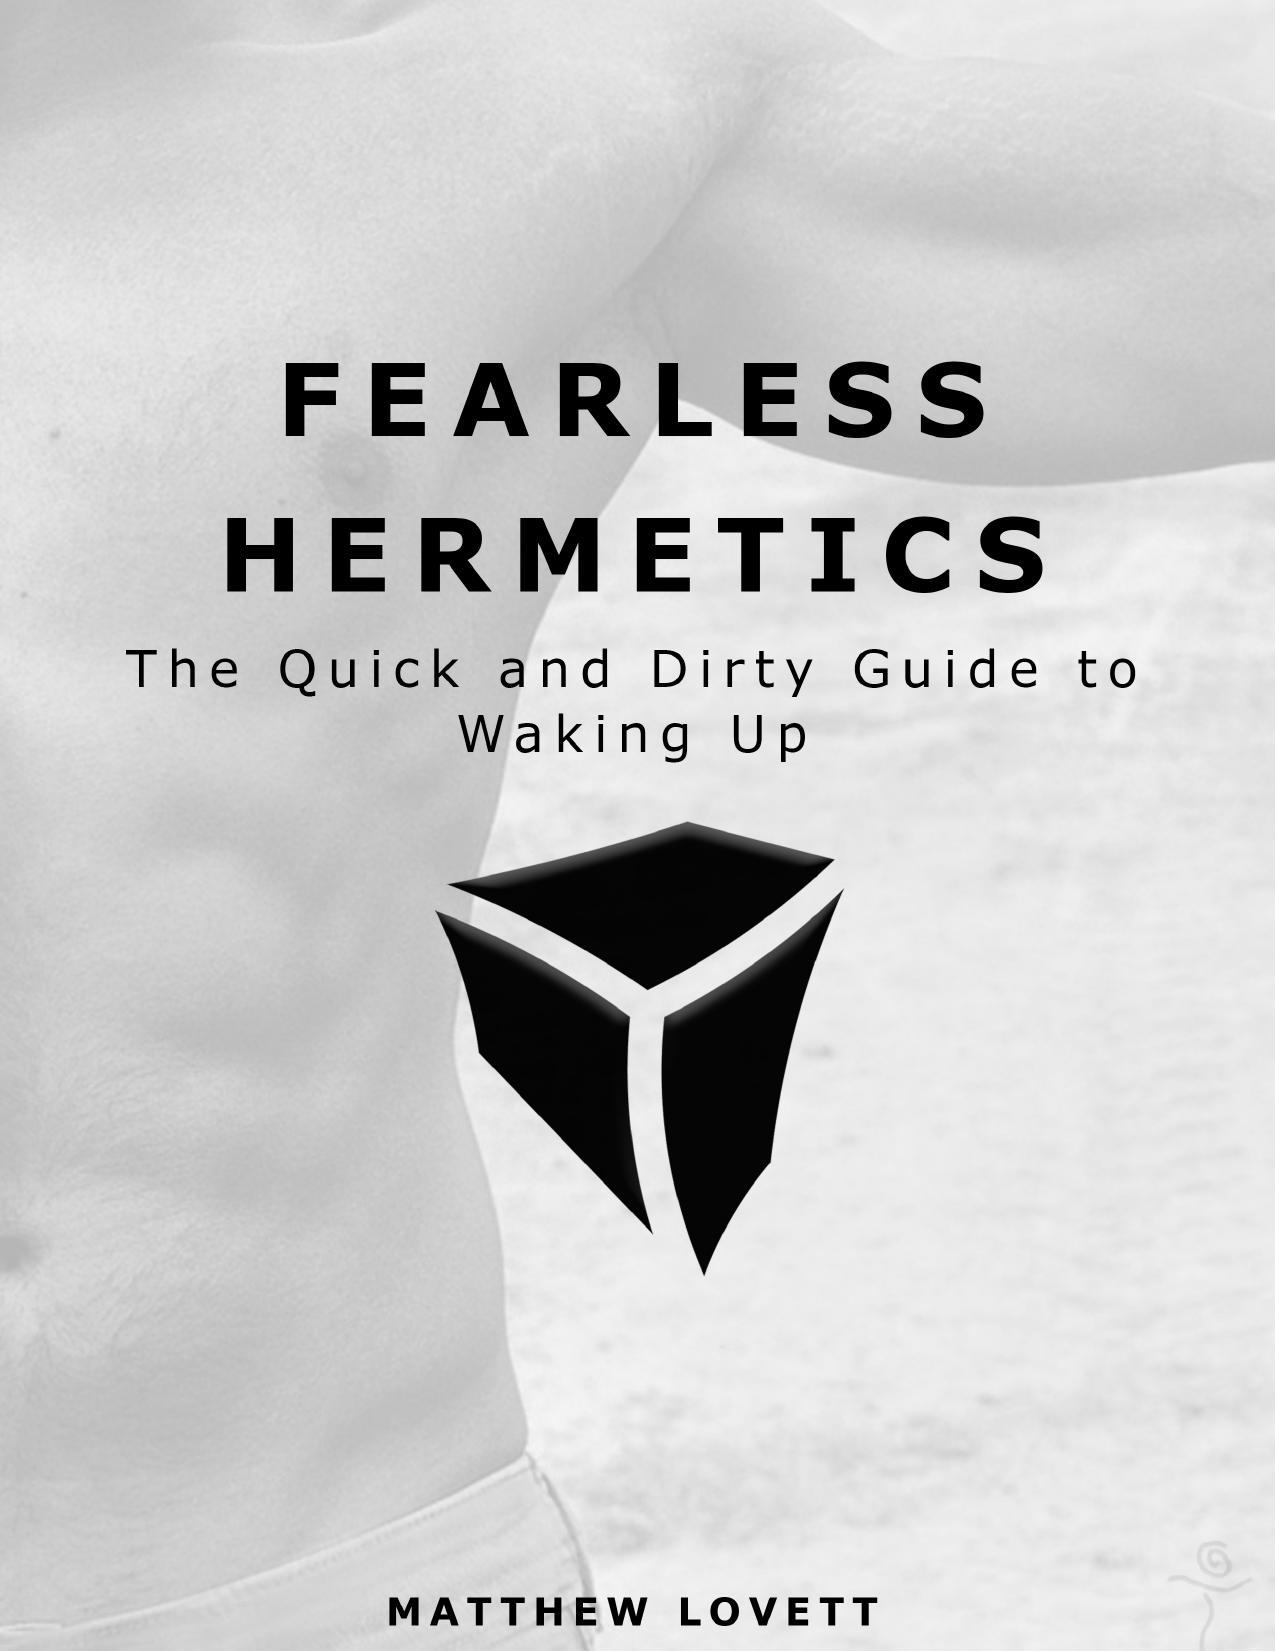 Fearless Hermetics Matthew Lovett author